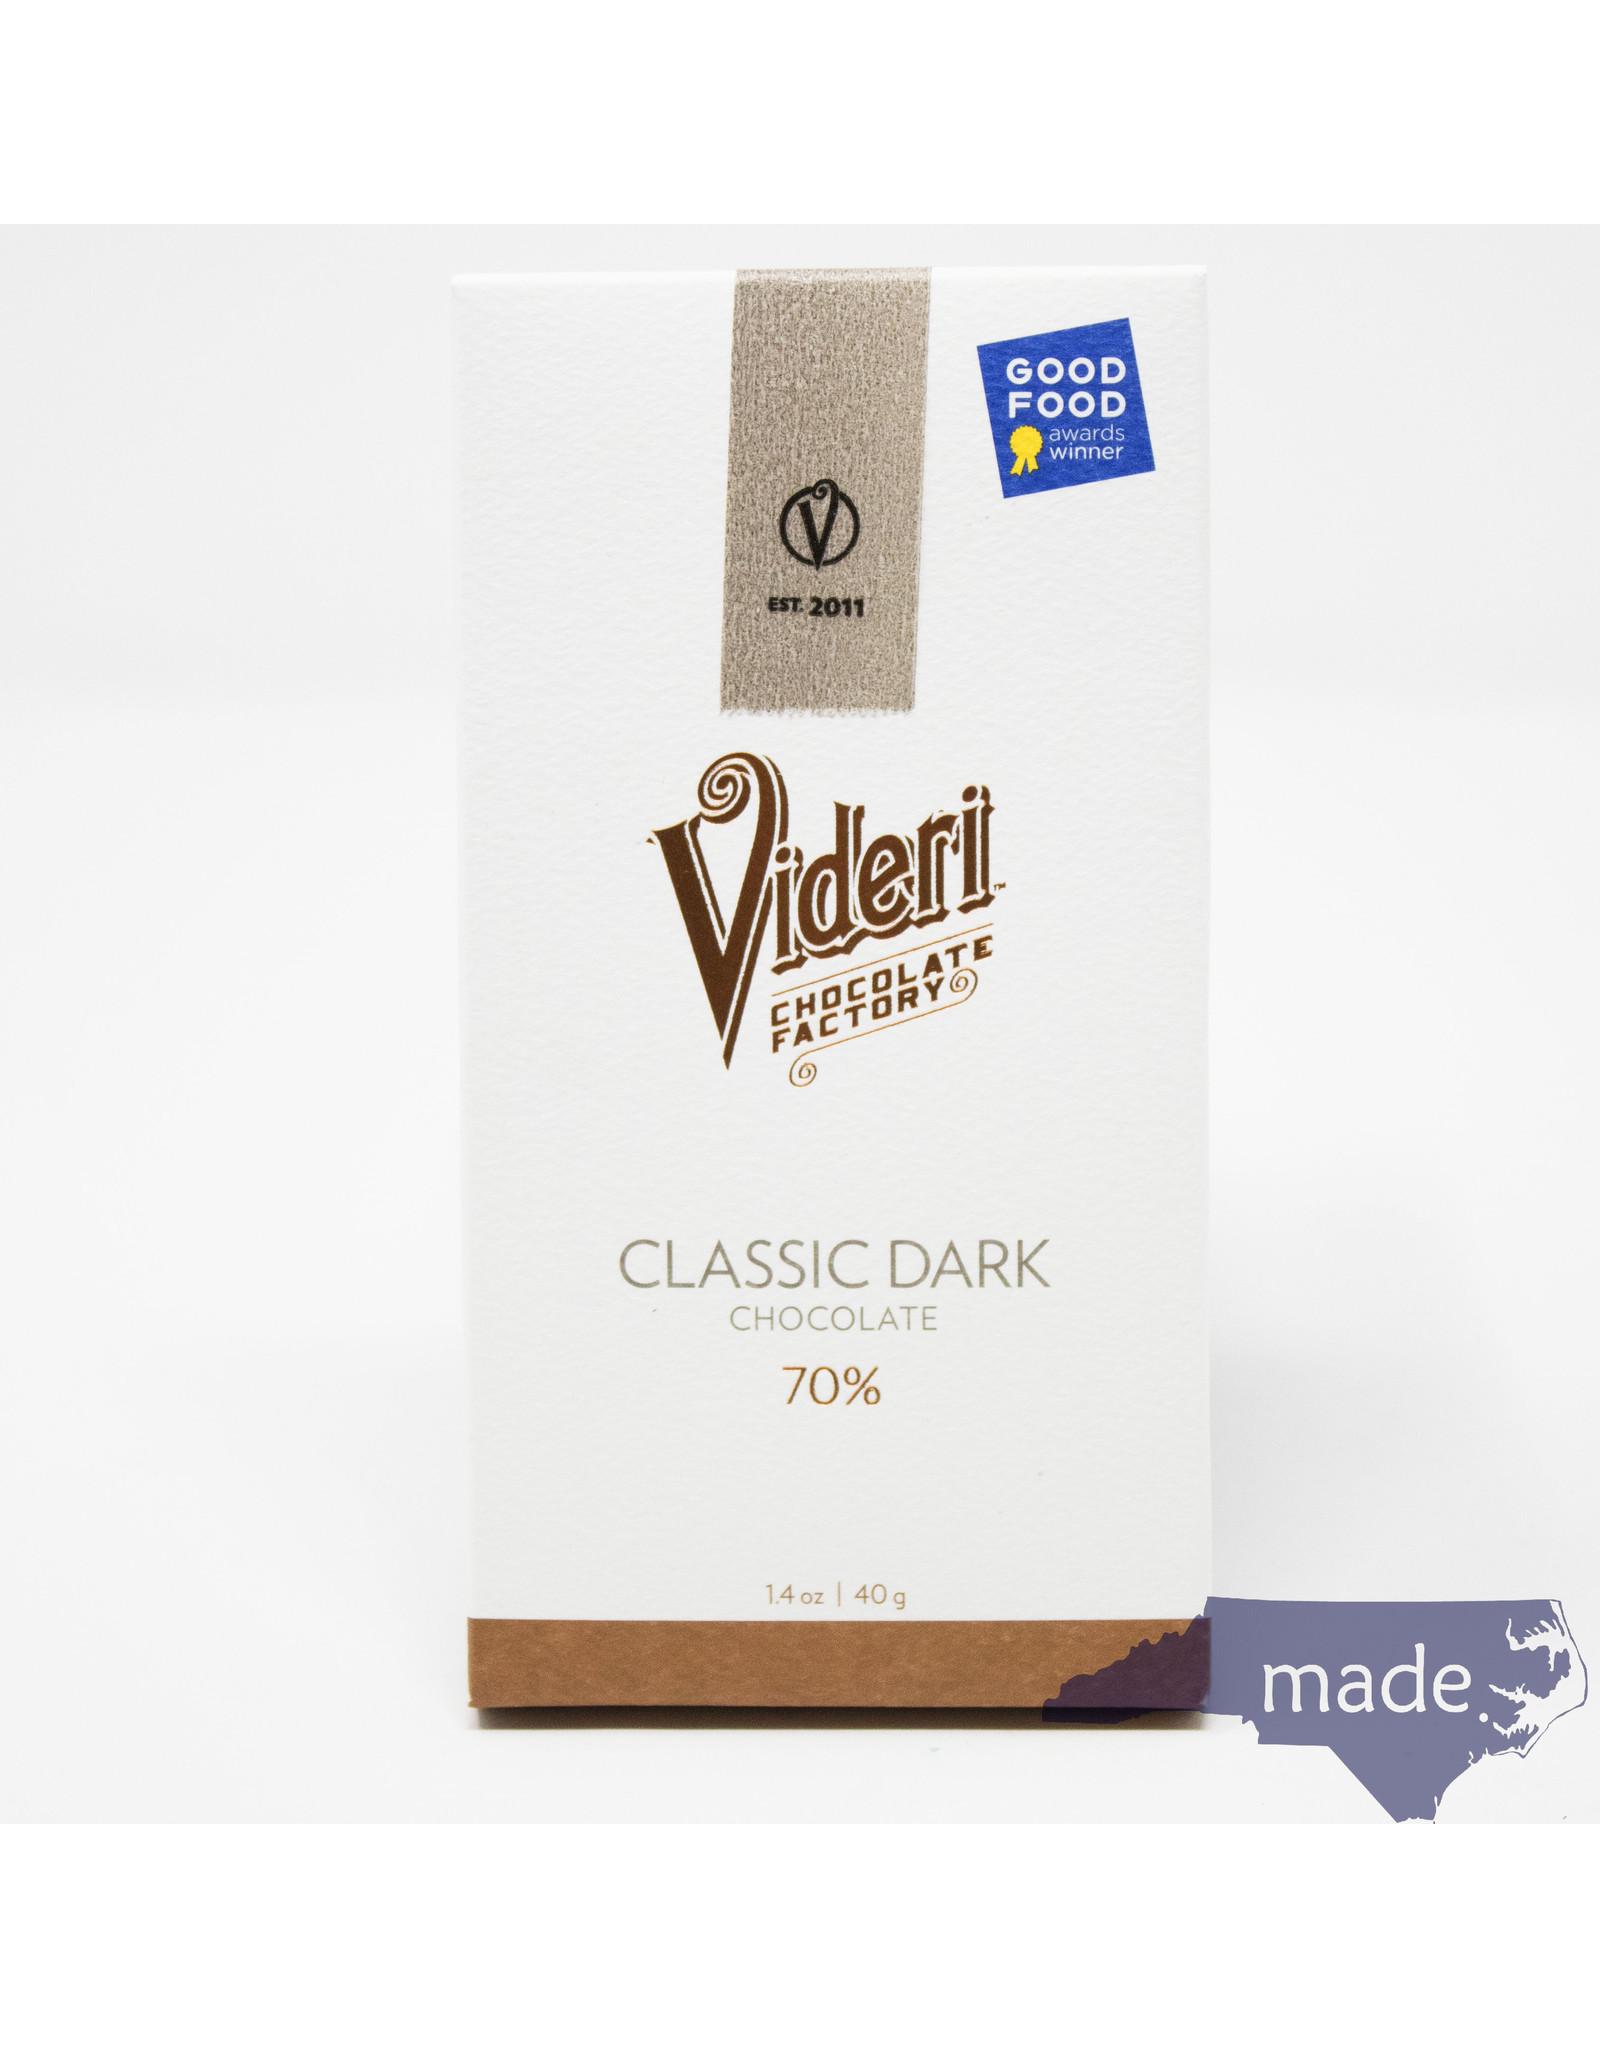 Videri Chocolate Factory Classic Dark Chocolate - Videri Chocolate Factory Bar